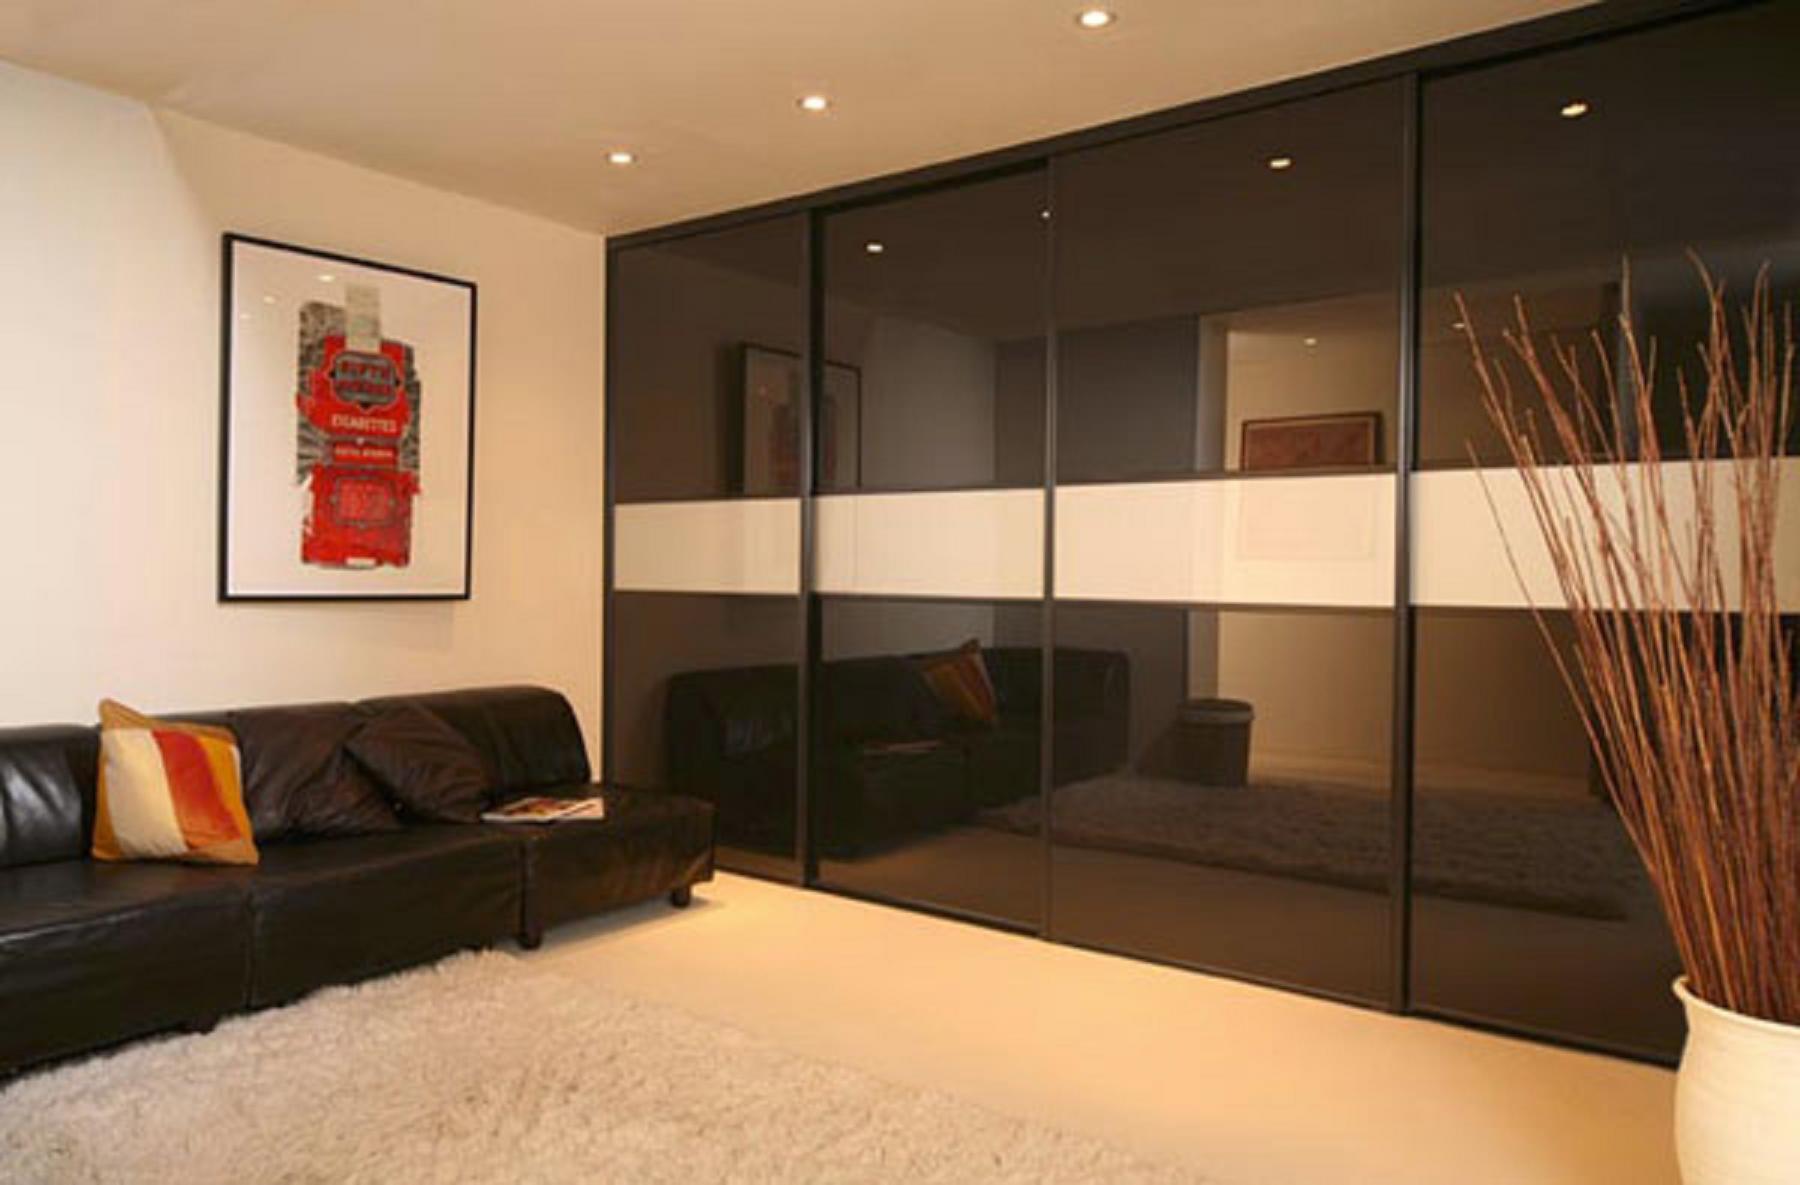 Дизайн зала со шкафом купе.